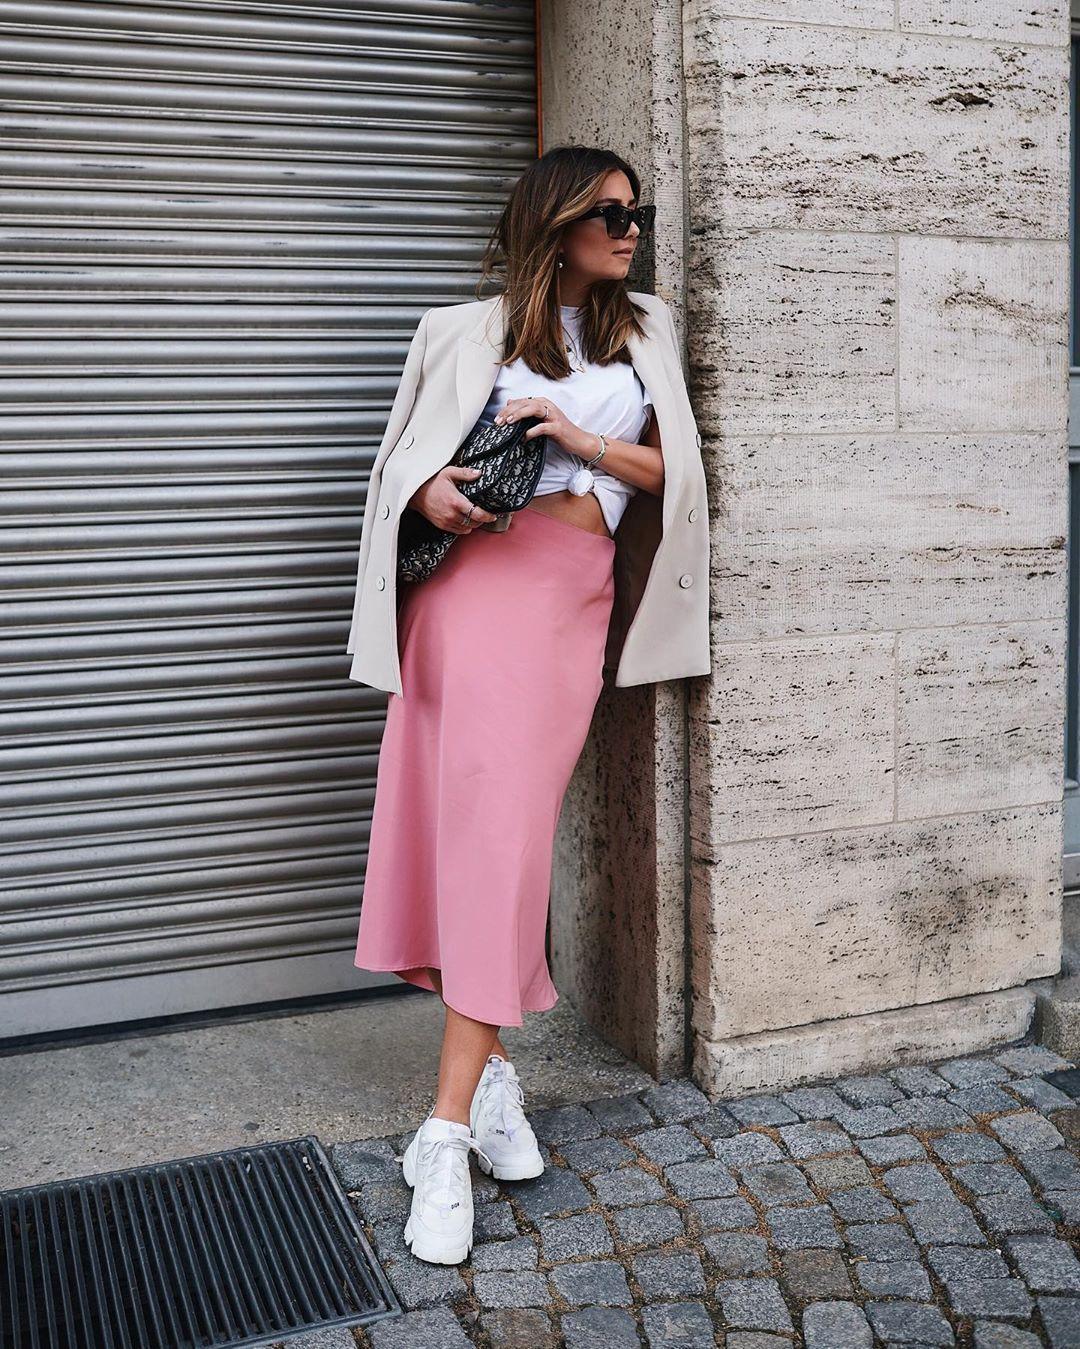 61dc9de8848 skirt, pink skirt, satin, zara, white sneakers, blazer, double ...